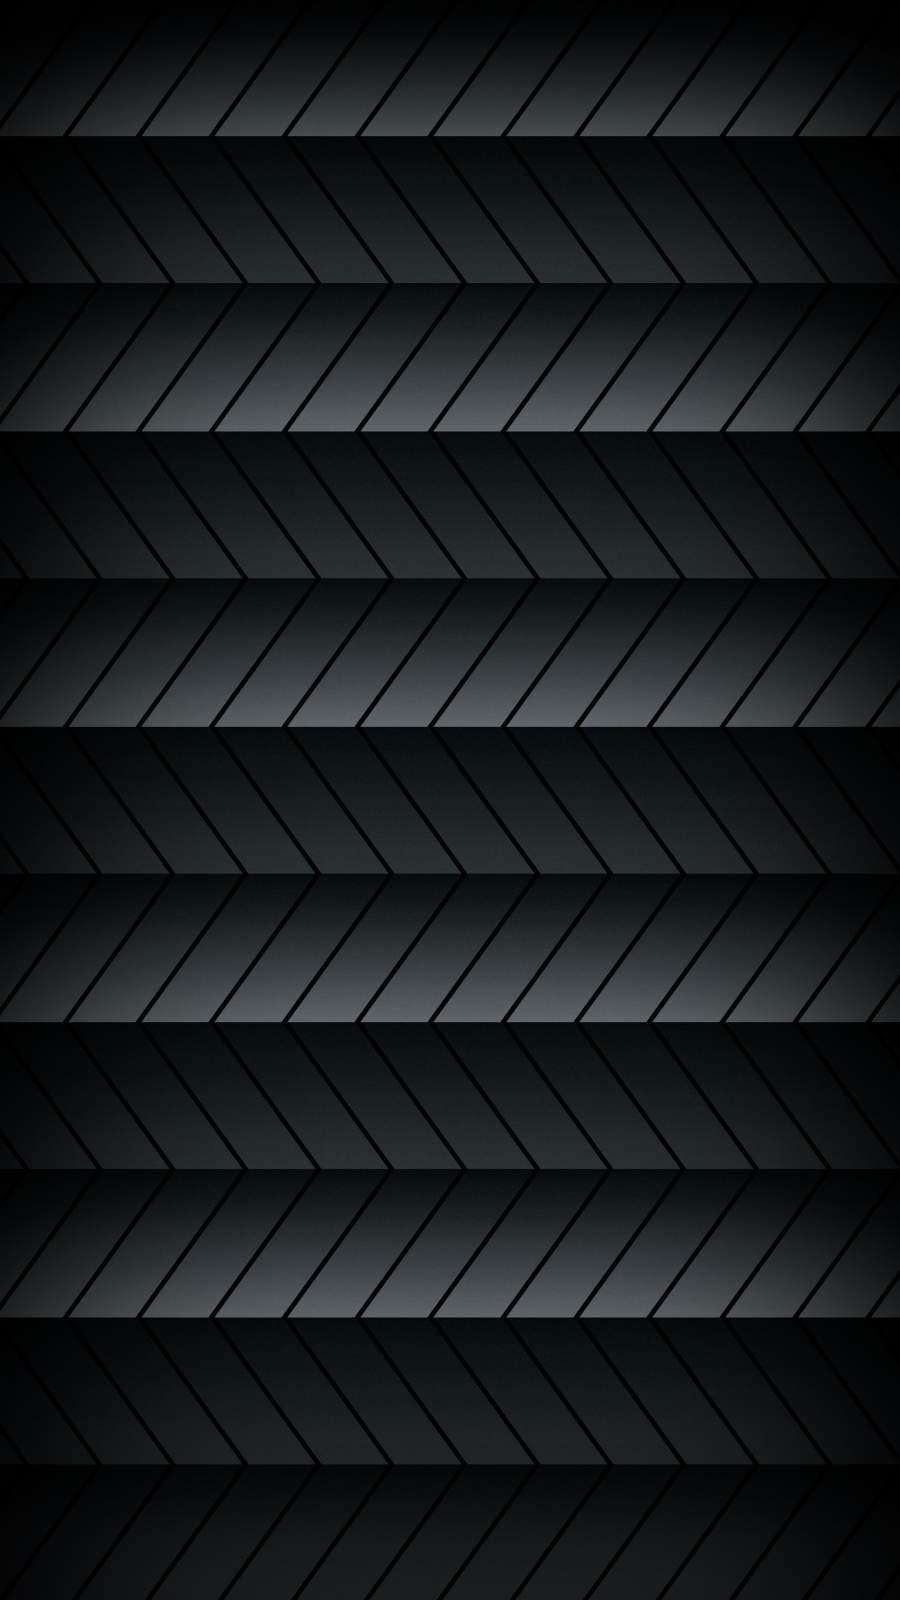 iPhone Home Screen Shelf Wallpaper